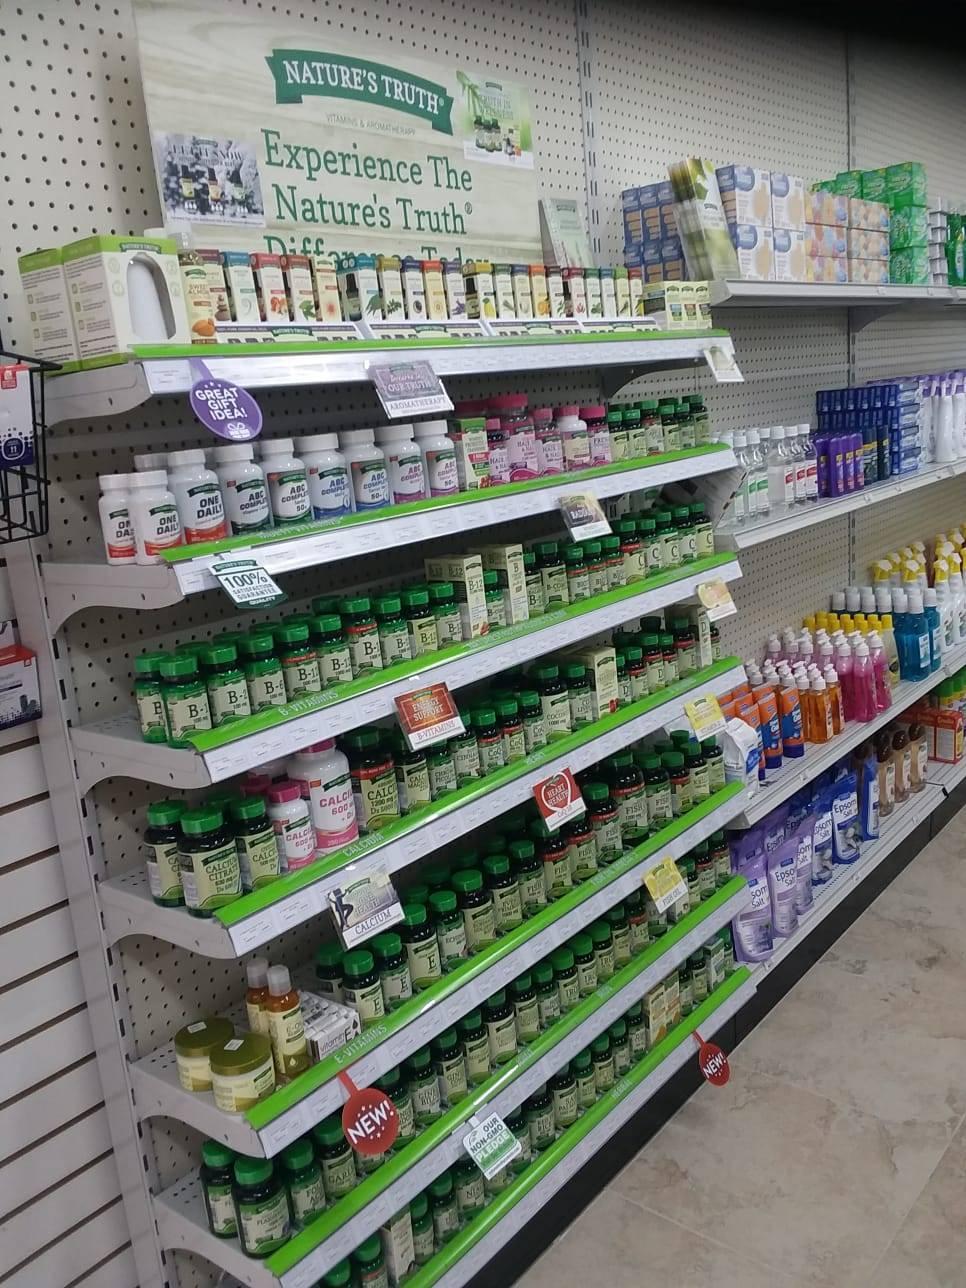 Palisade Rx Pharmacy - pharmacy  | Photo 2 of 14 | Address: 296 Palisade Ave, Jersey City, NJ 07307, USA | Phone: (201) 292-1517